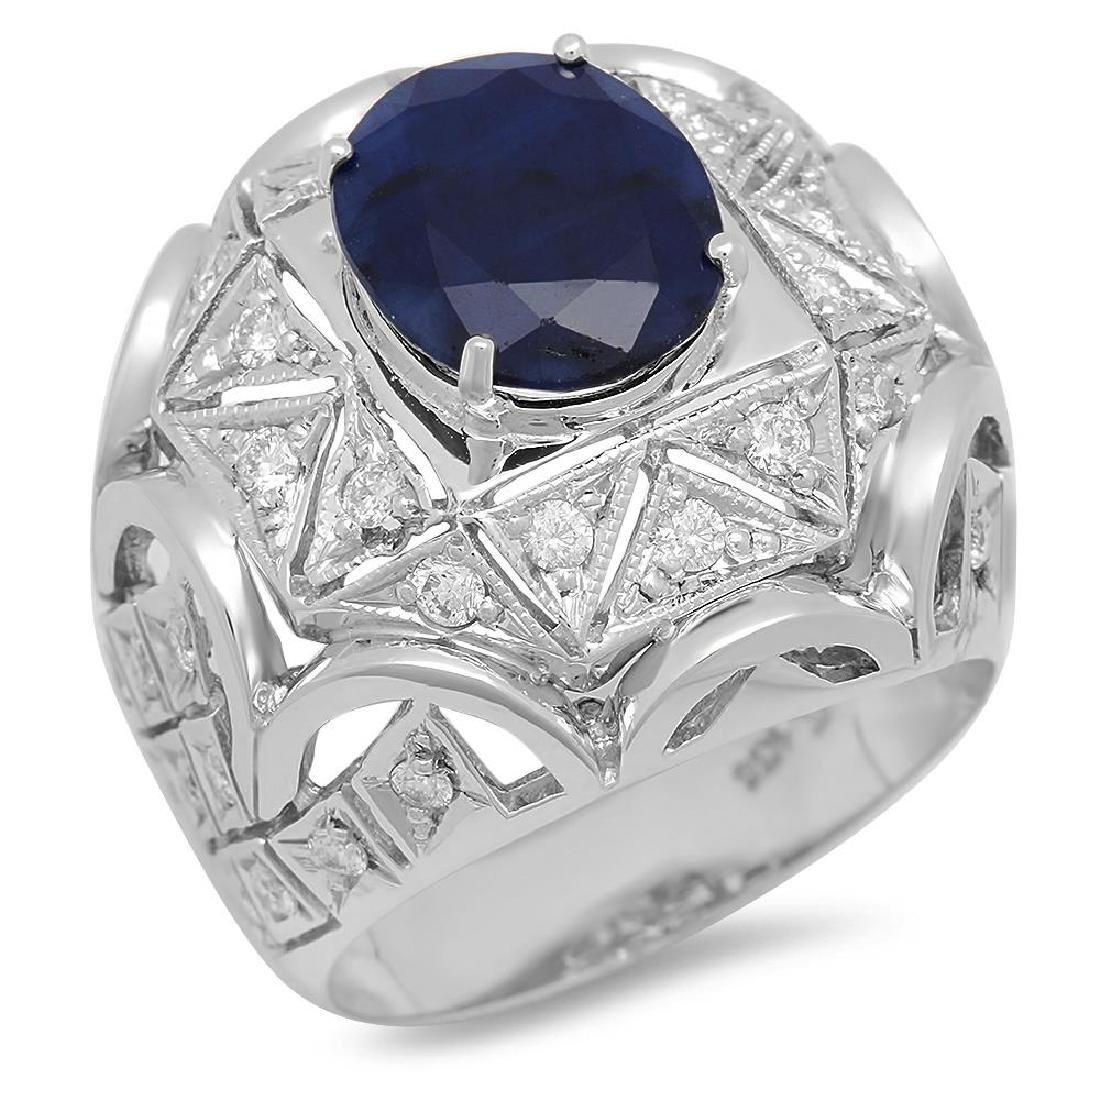 14K Gold 5.11ct Sapphire 1.07cts Diamond Ring